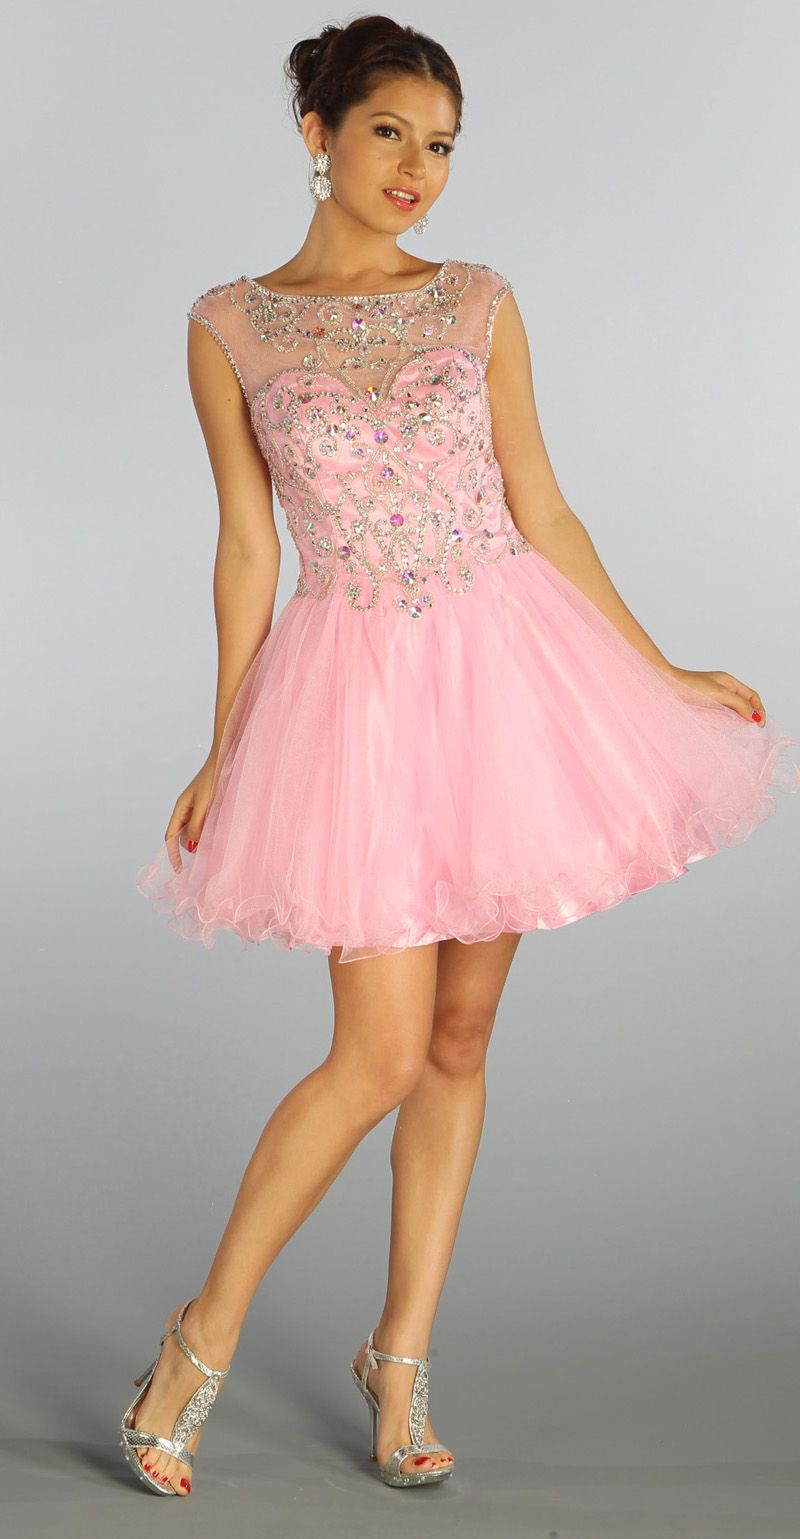 Coral Sleeveless Beaded Short Mesh Prom Dress Discountdressup Com Homecoming Dresses Dresses Cheap Dresses [ 1539 x 800 Pixel ]